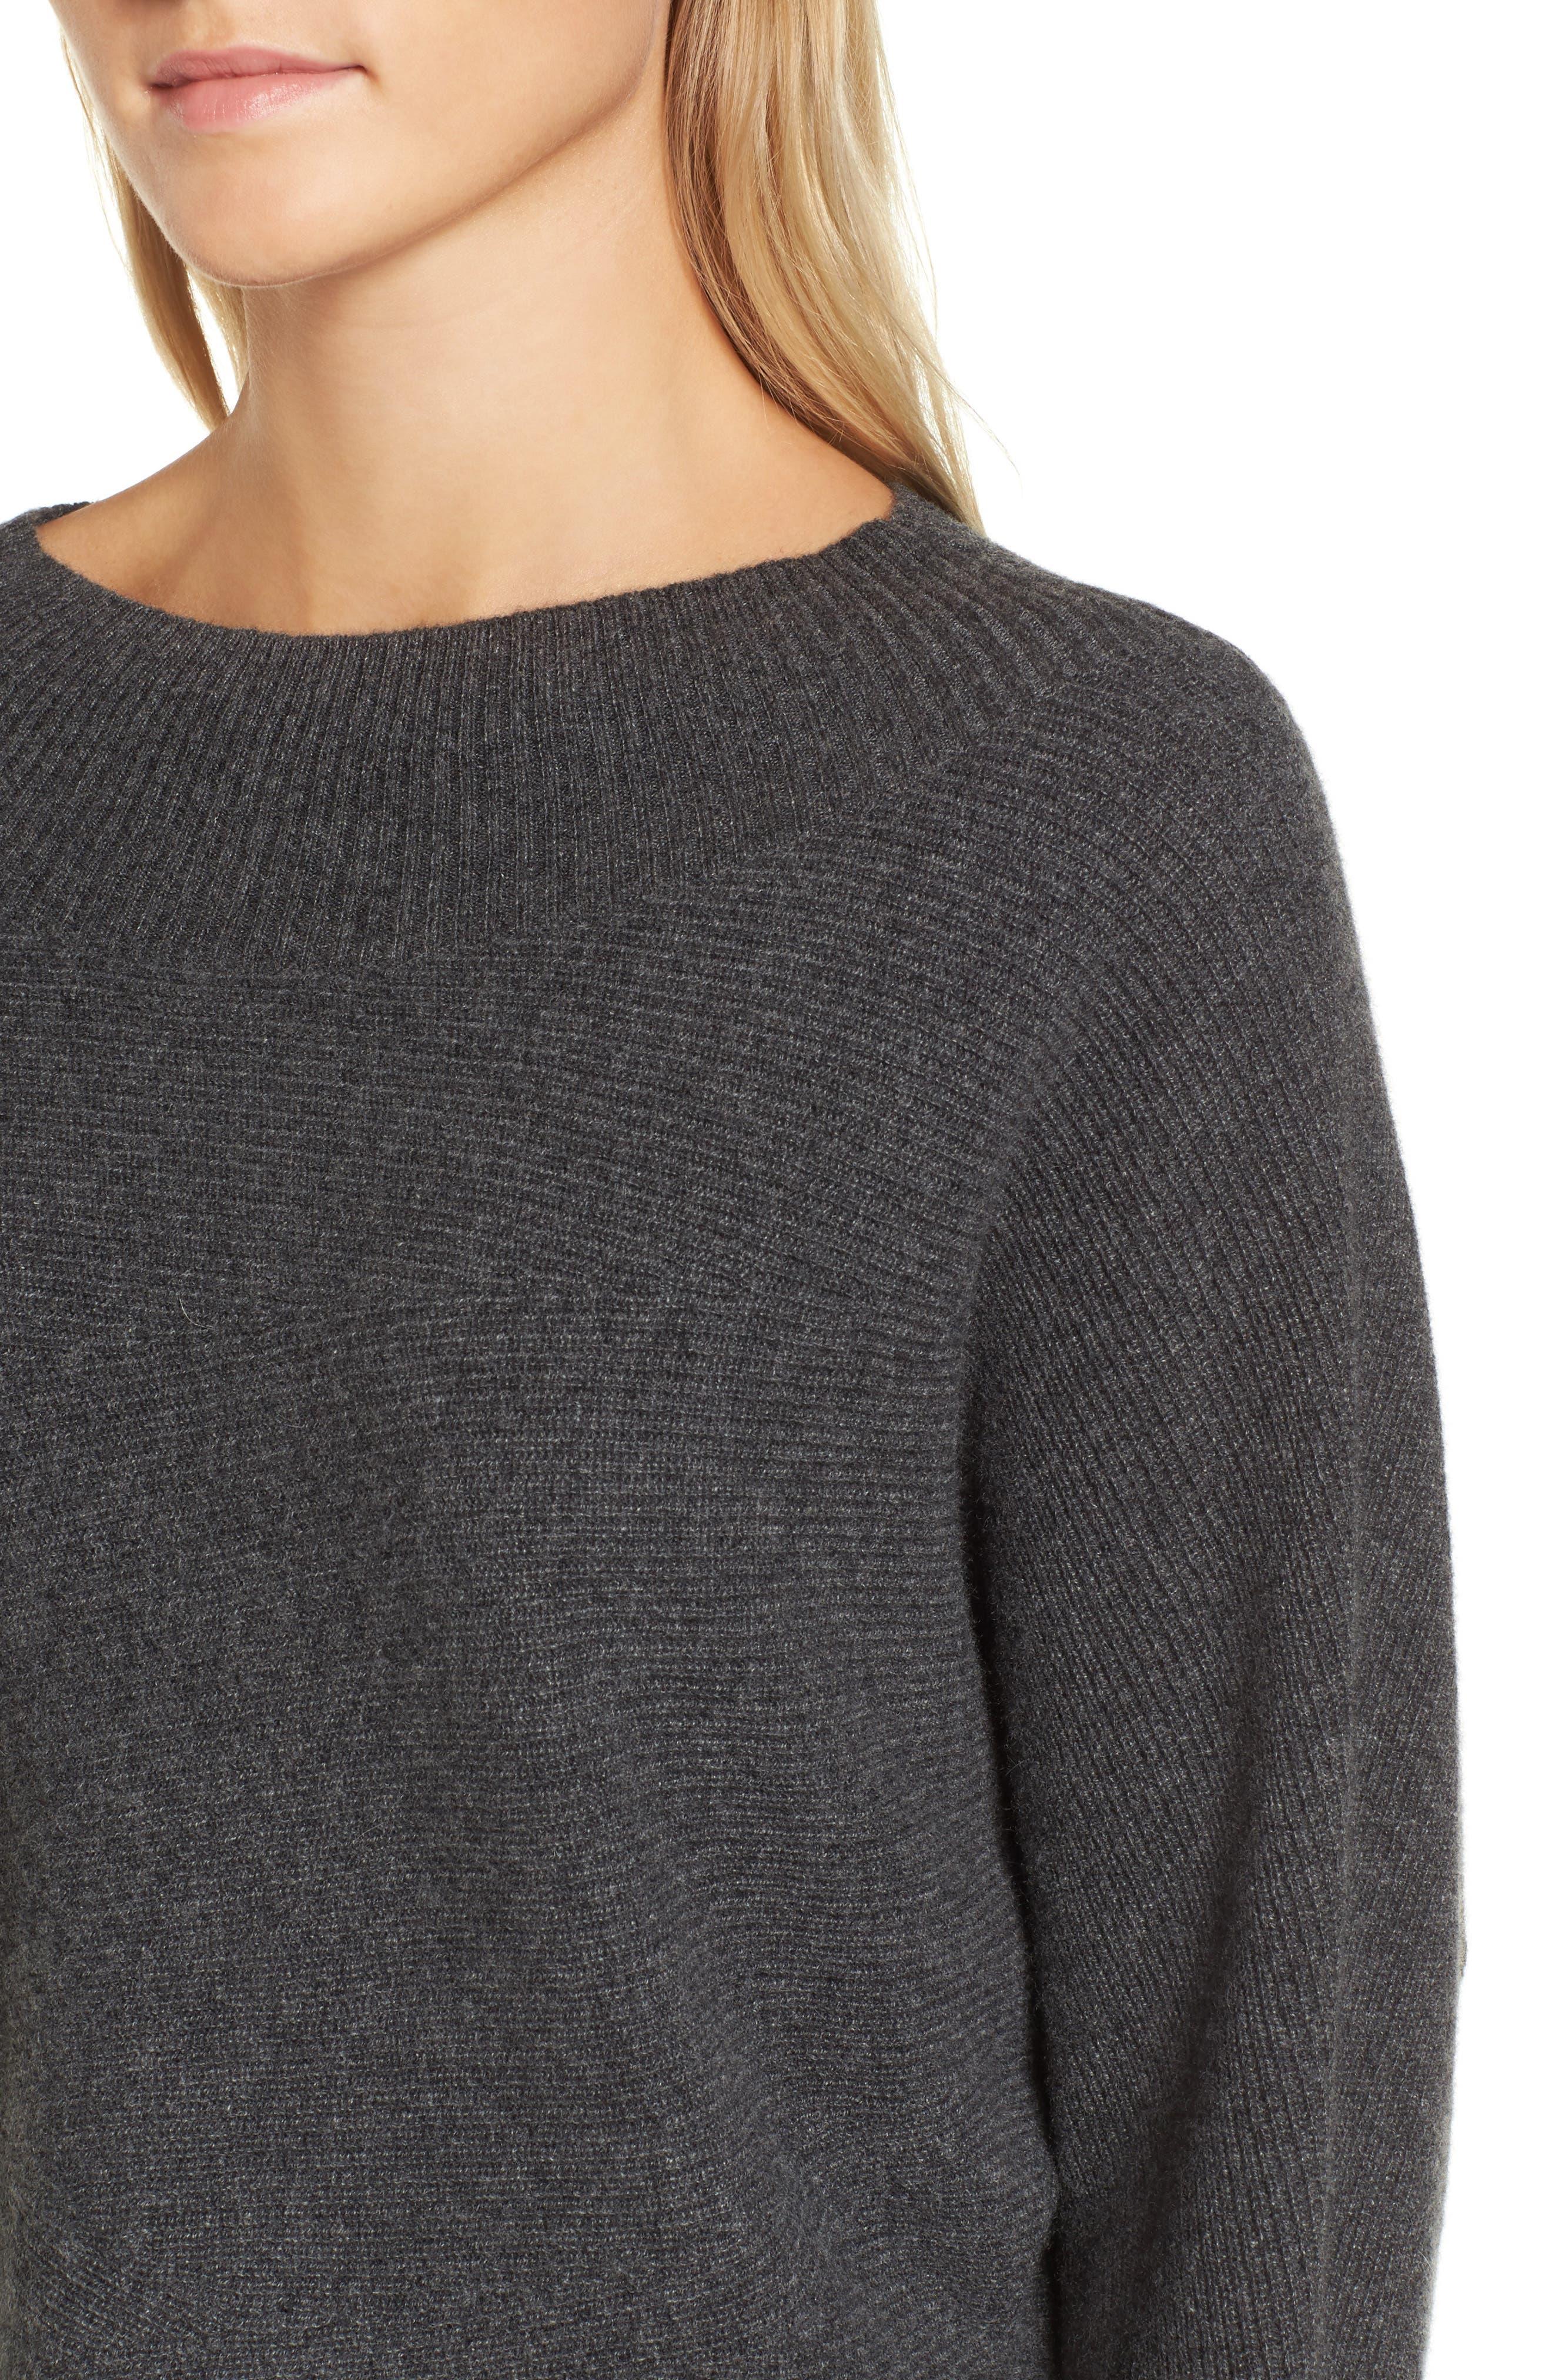 Dolman Sleeve Cashmere Sweater,                             Alternate thumbnail 4, color,                             Grey Castlerock Heather